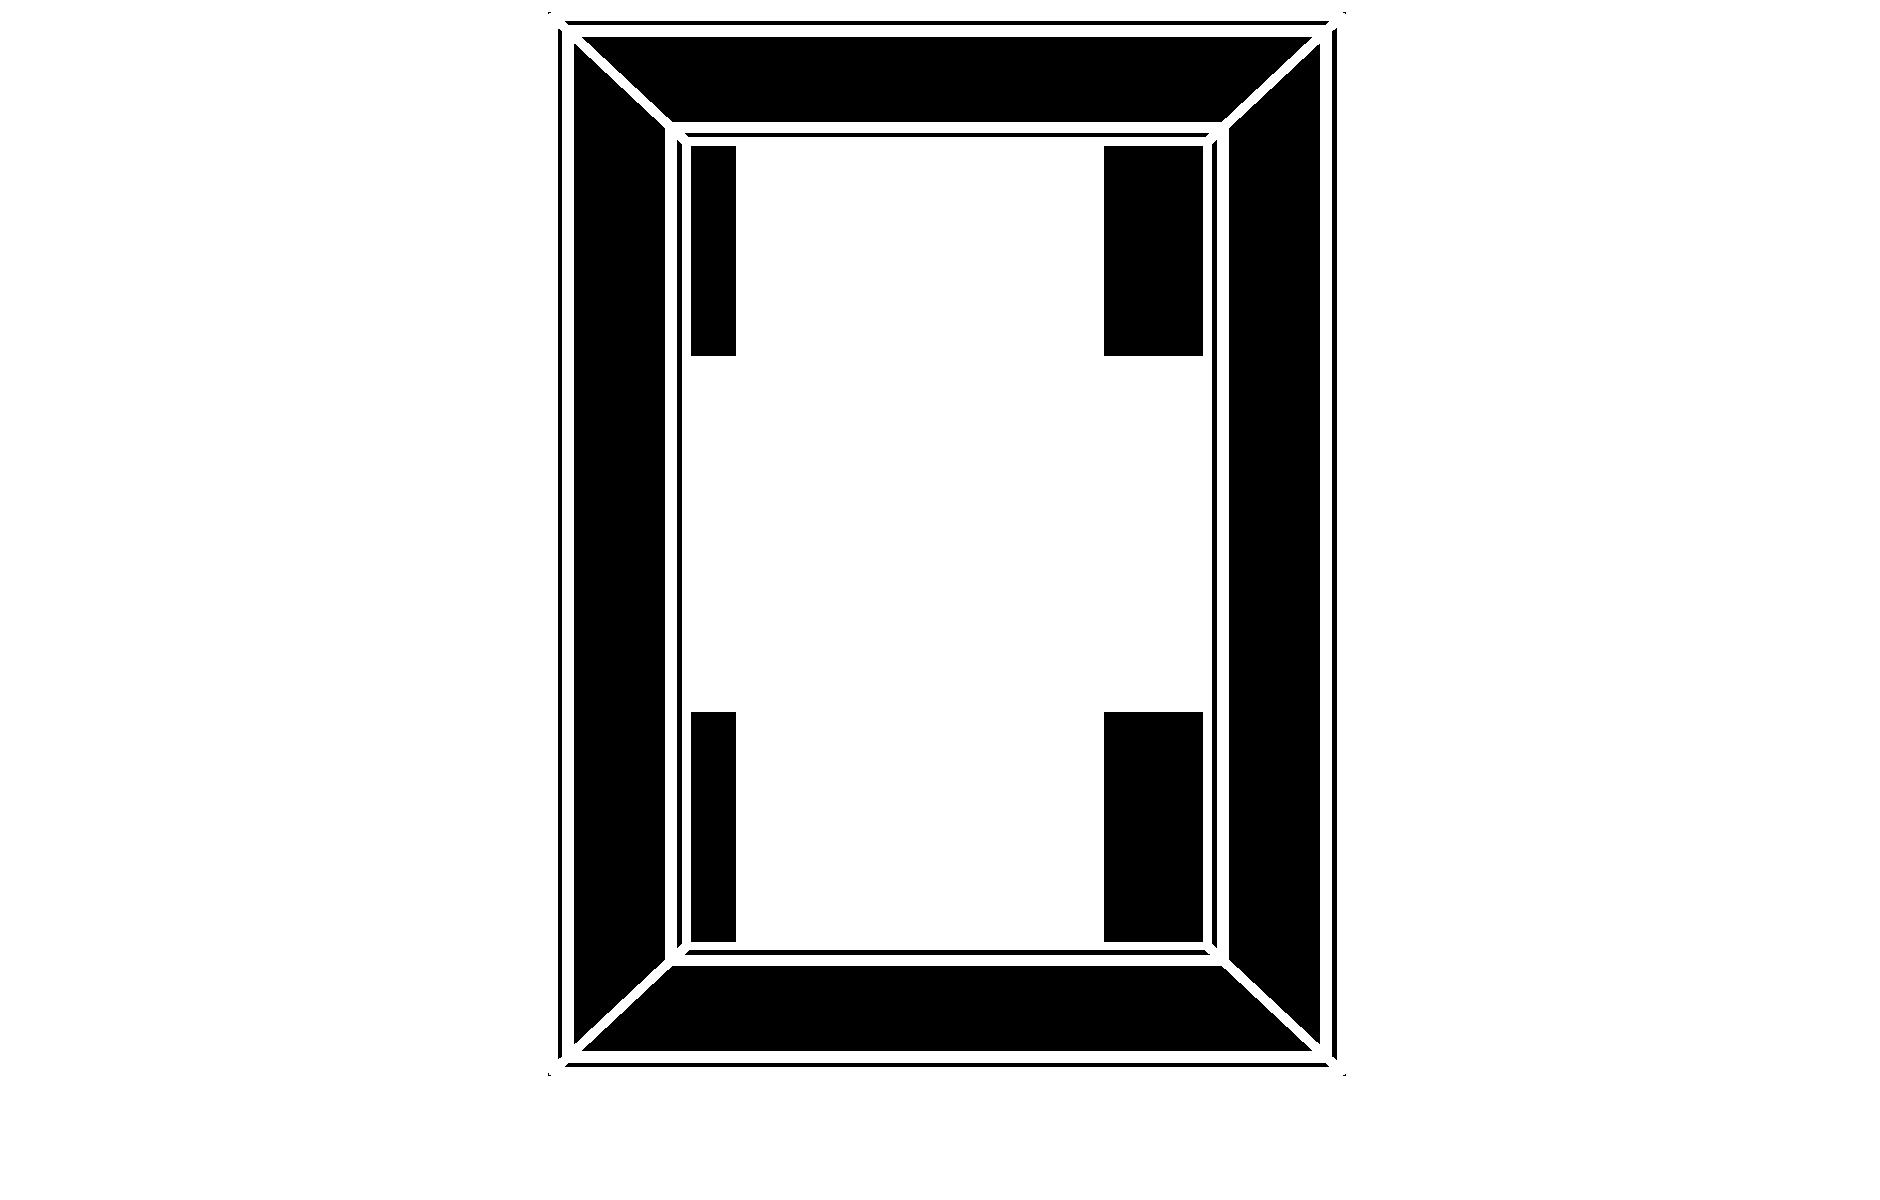 M101 mitered cabinet door configuration